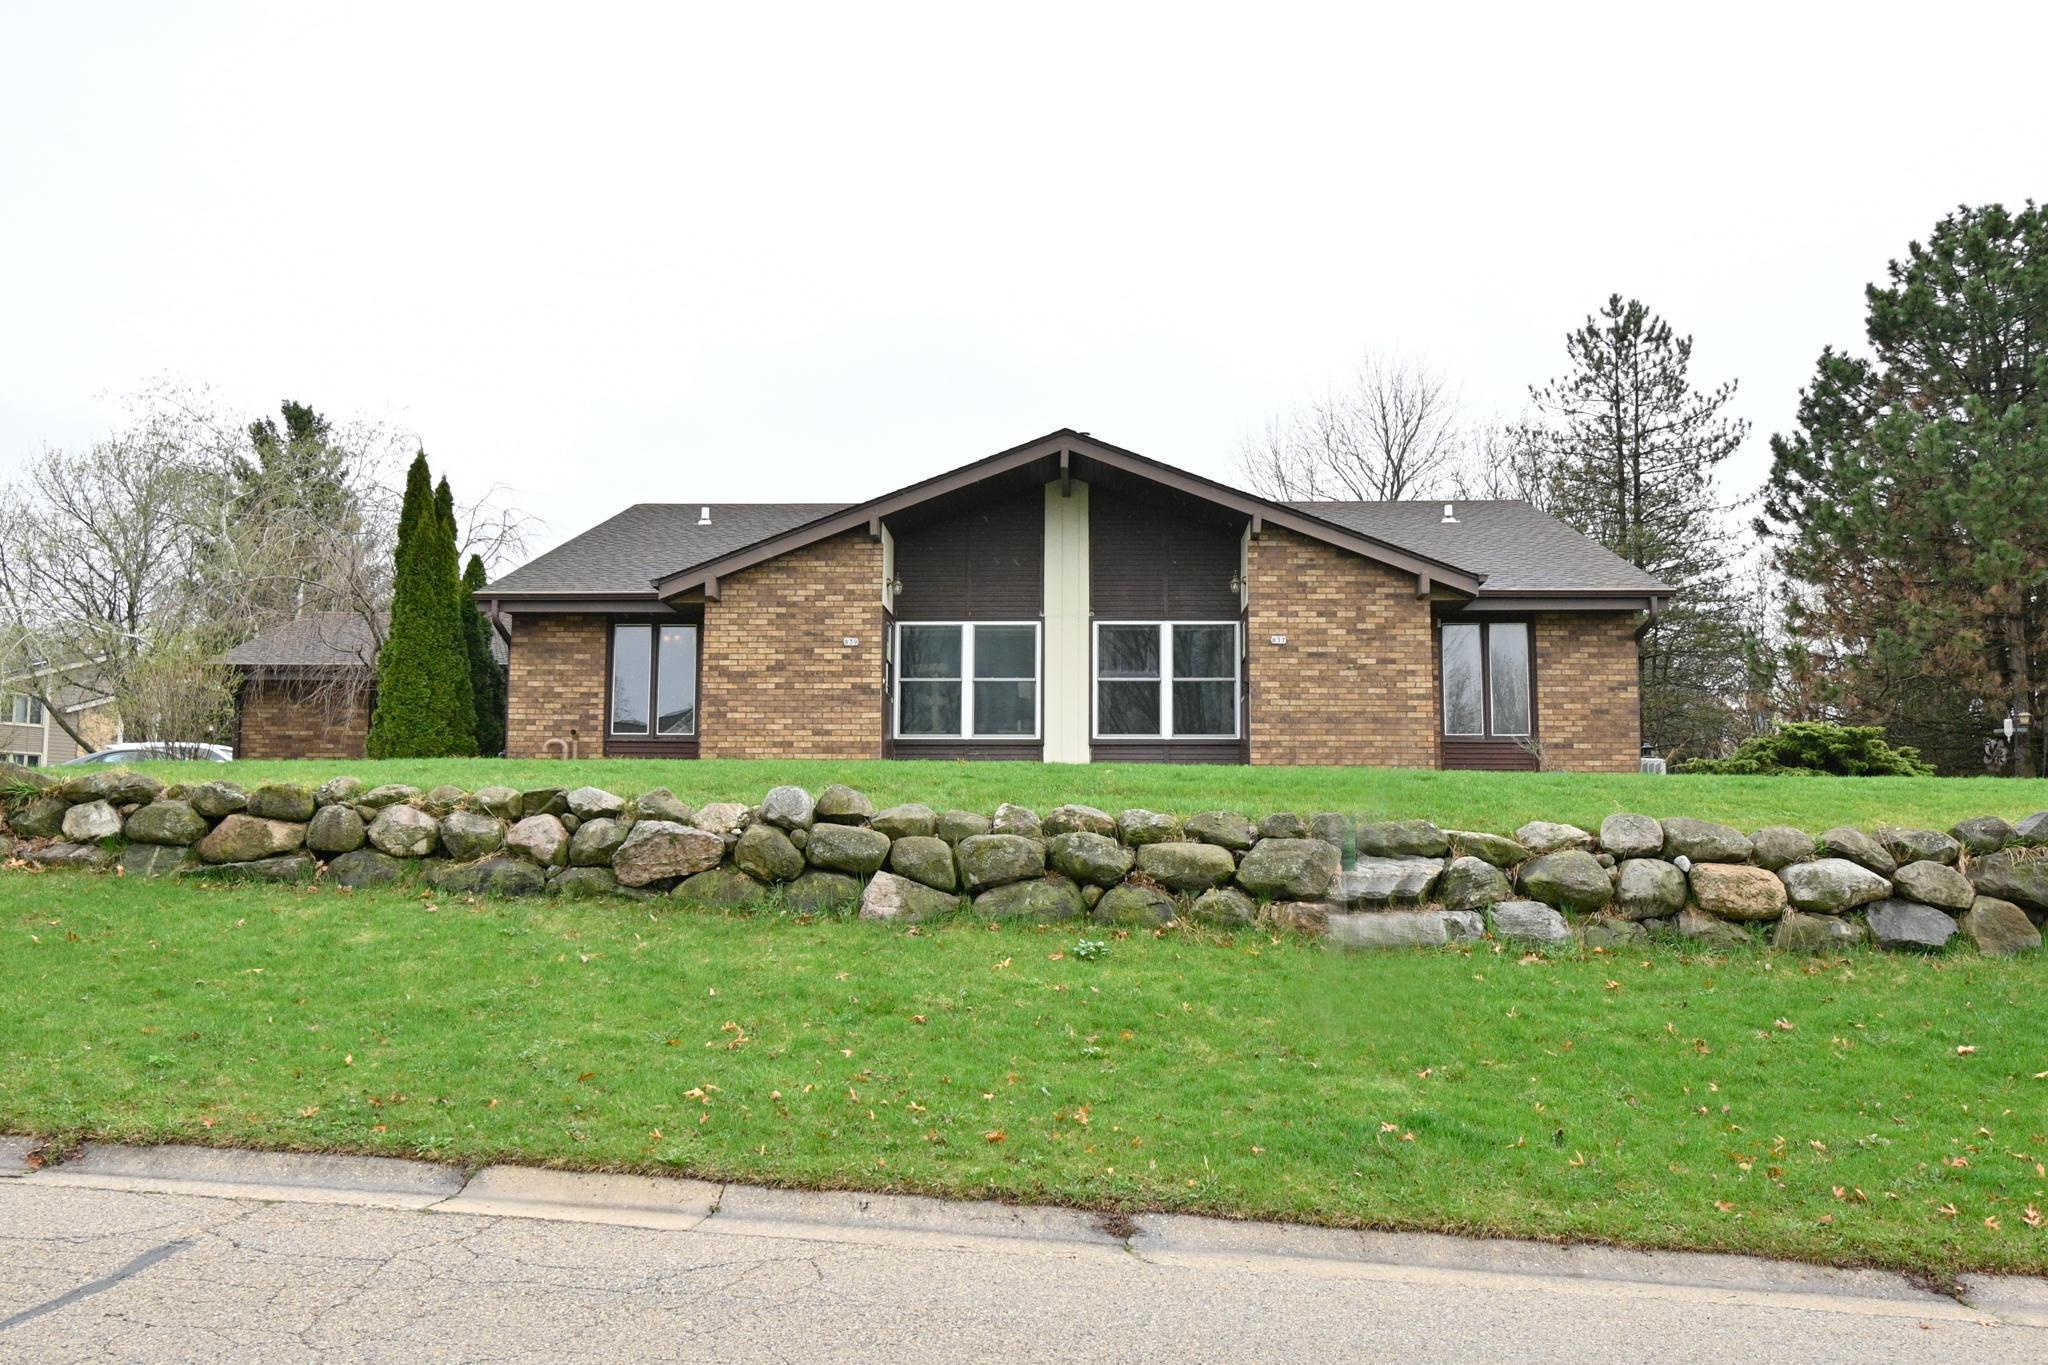 837 Crescent Ln, Hartland, Wisconsin 53029, 3 Bedrooms Bedrooms, 7 Rooms Rooms,1 BathroomBathrooms,Two-Family,For Sale,Crescent Ln,1,1734413